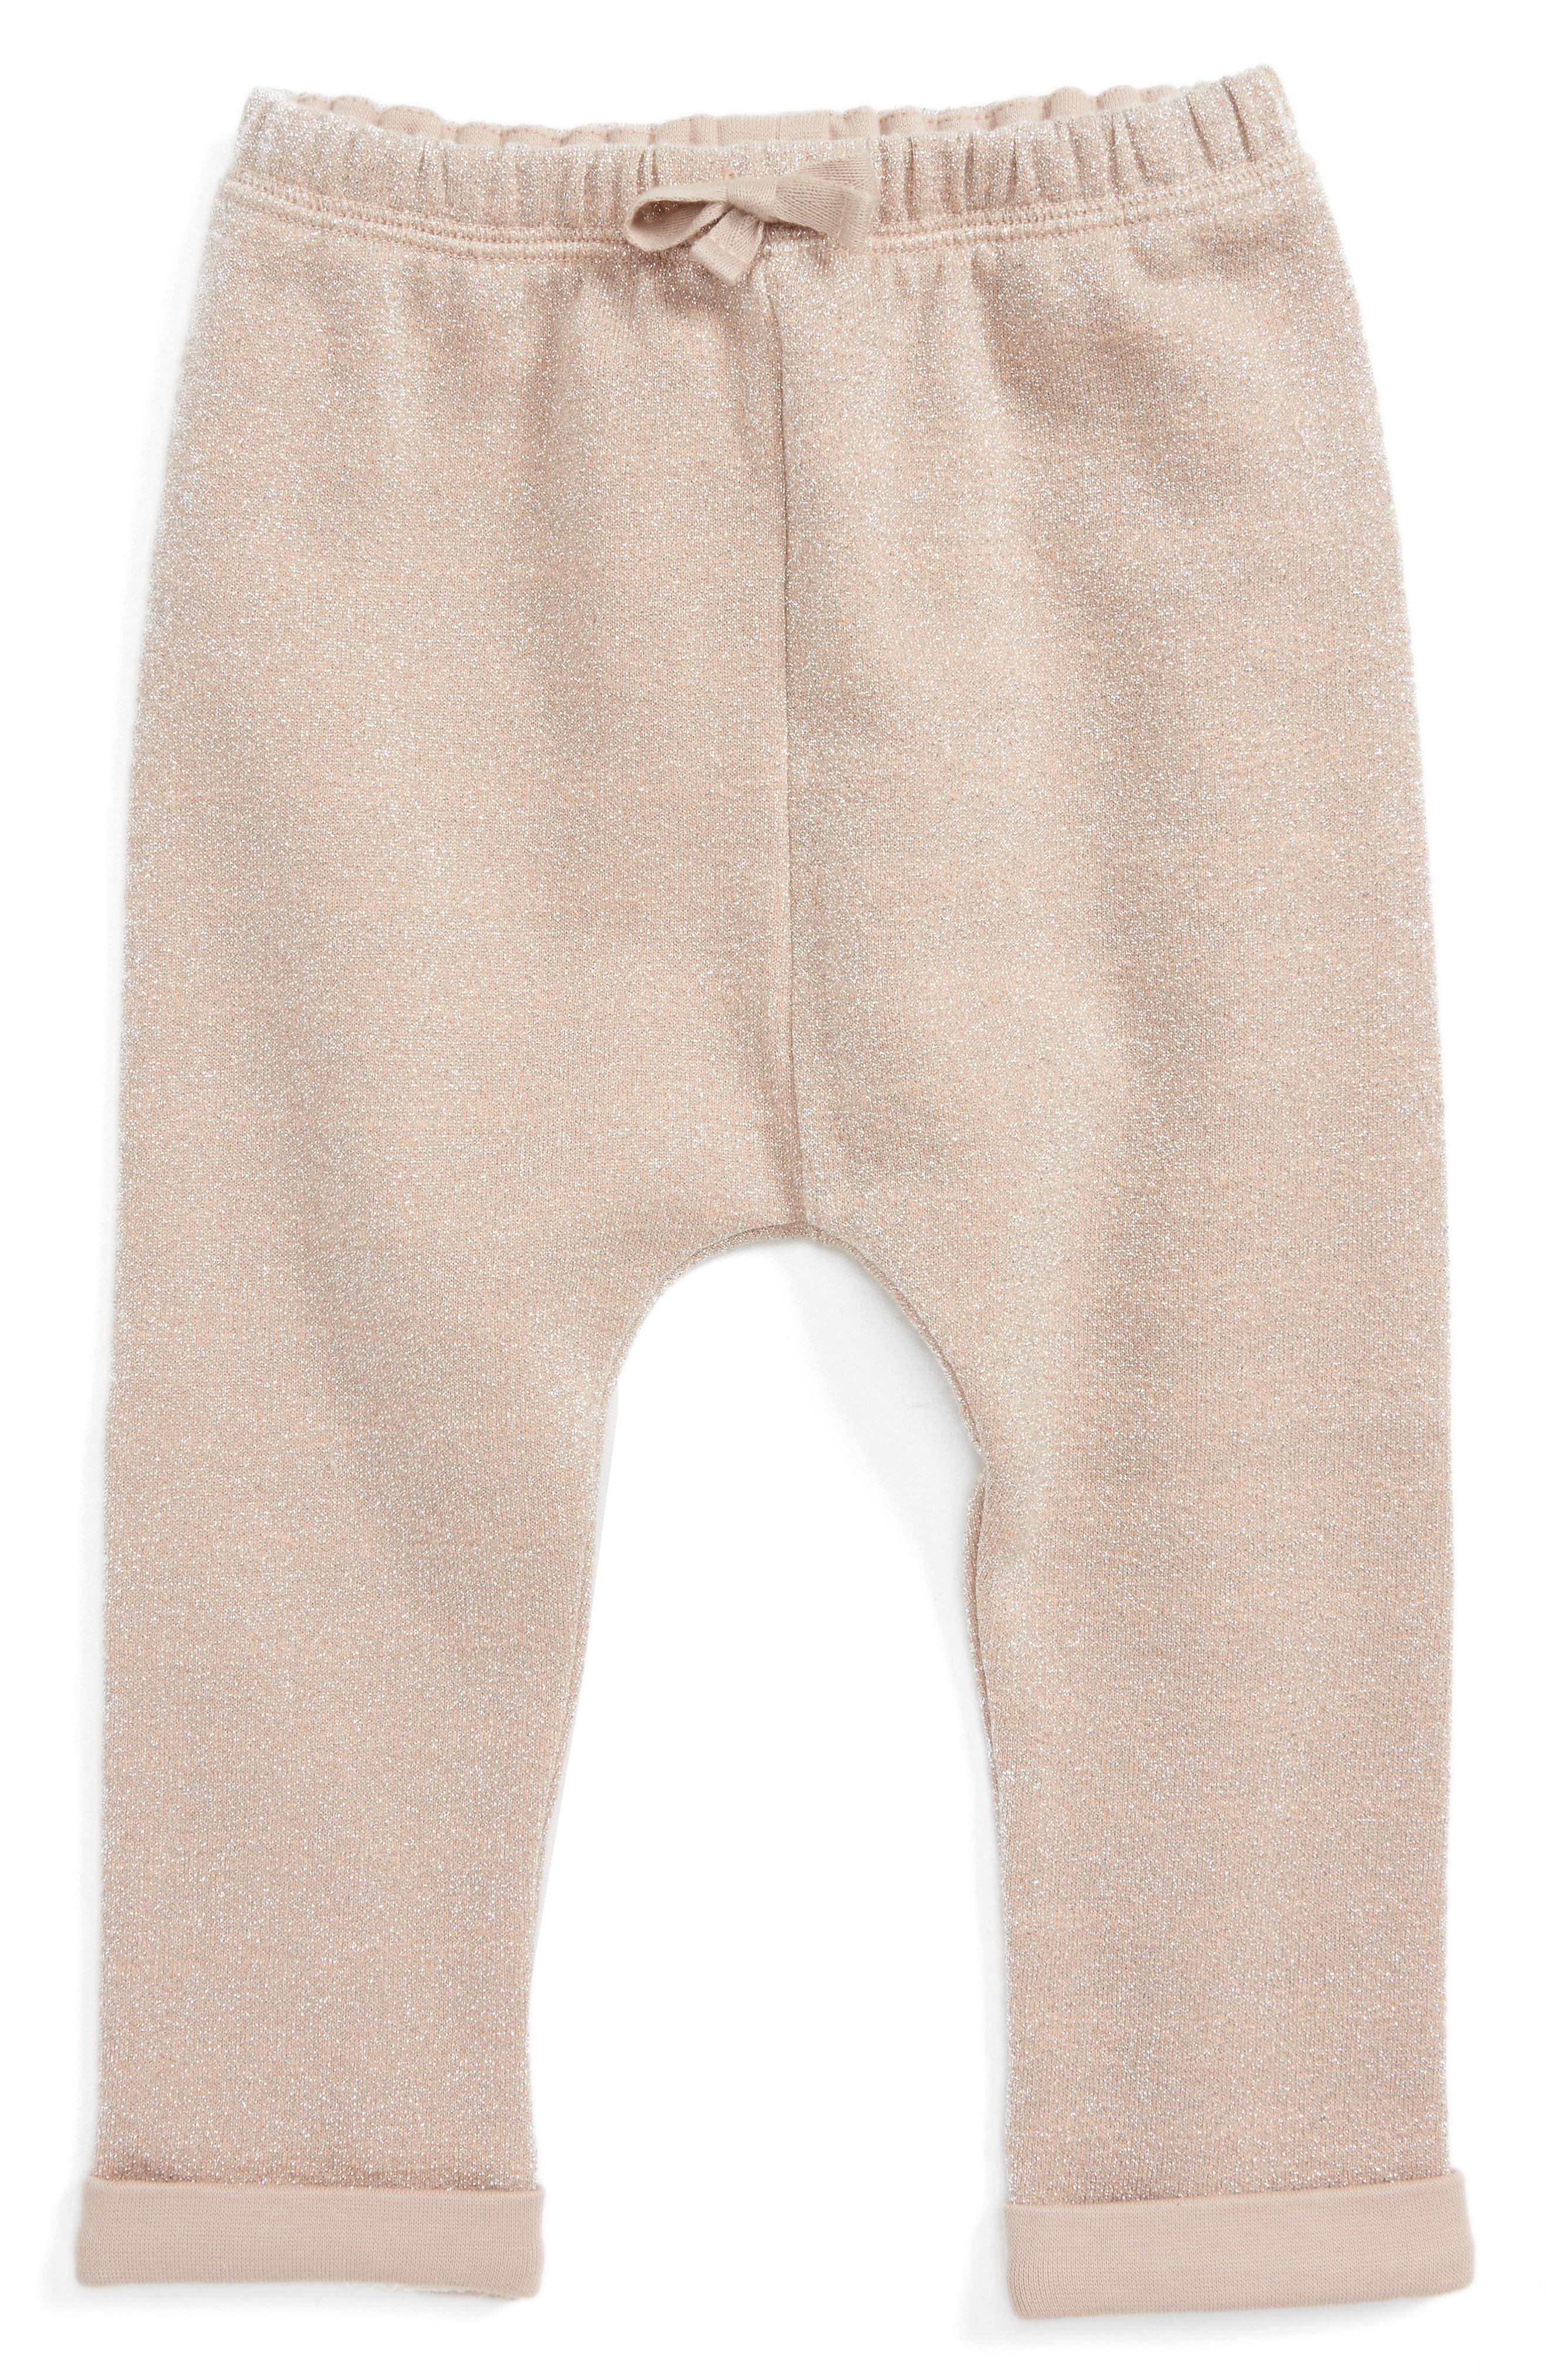 Peek Sparkle Pants (Baby Girls)